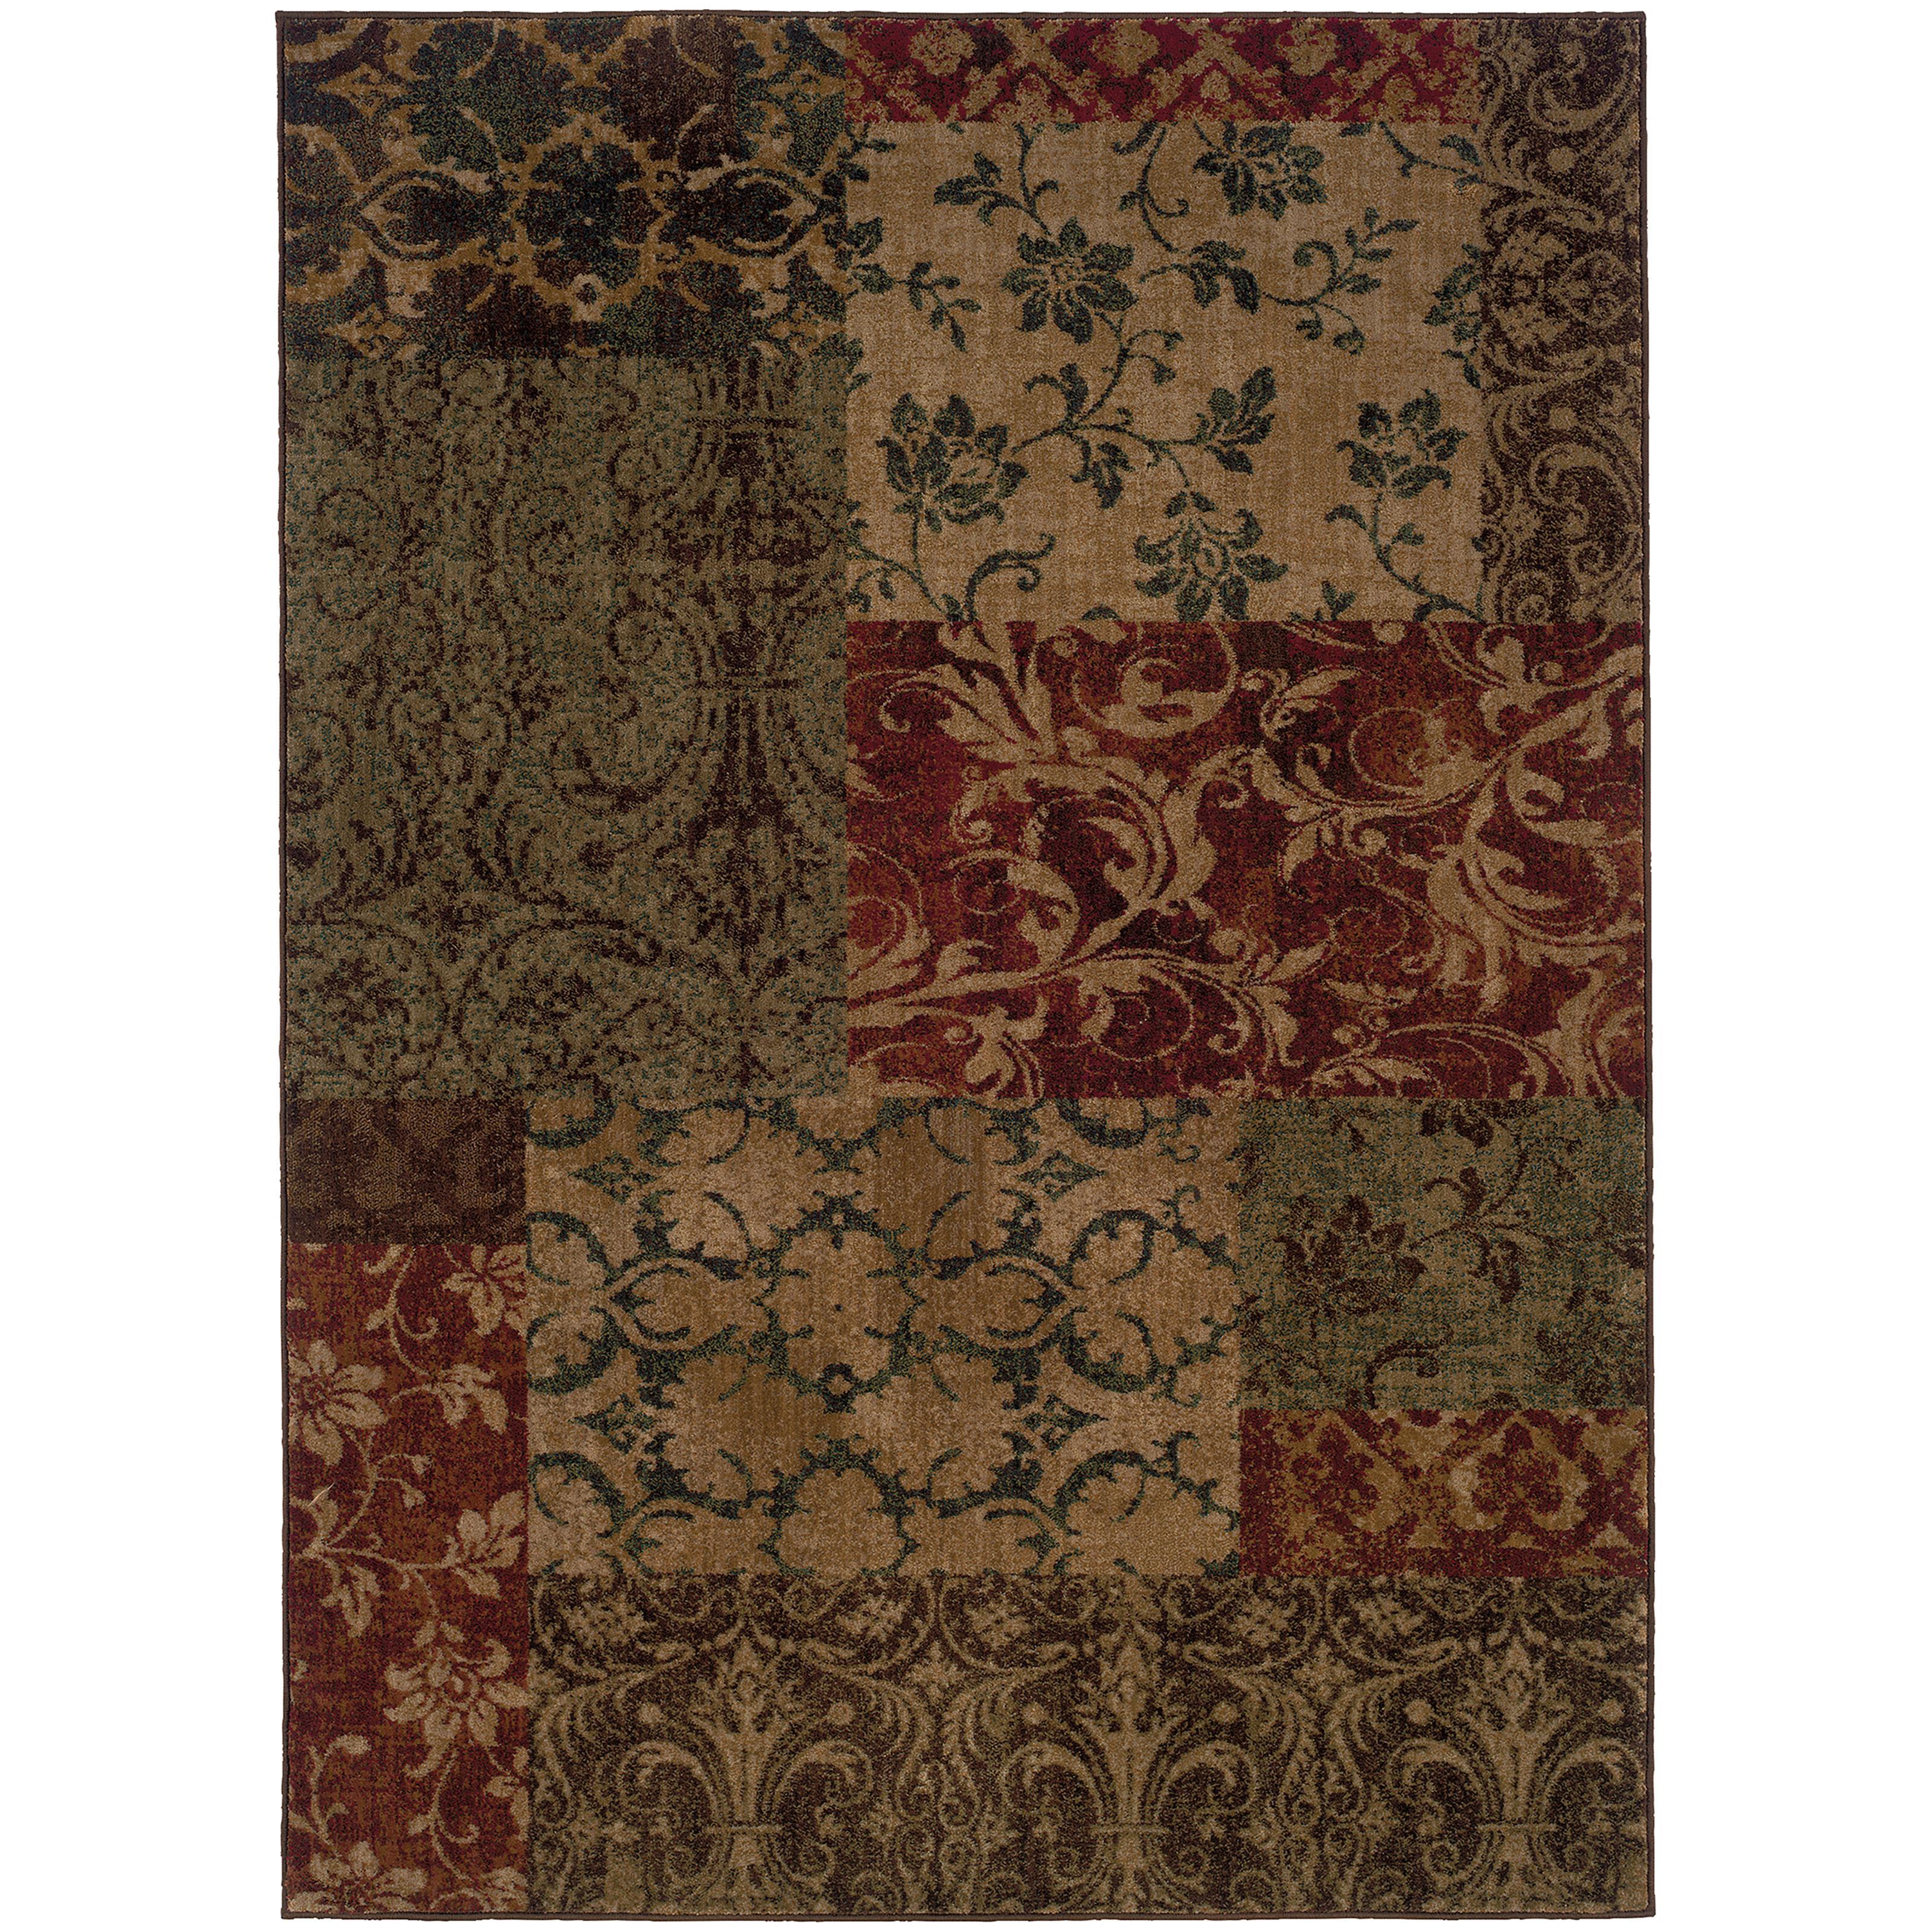 "Oriental Weavers Allure 9'10"" X 12' 9"" Rug - Item Number: A058B1300390ST"